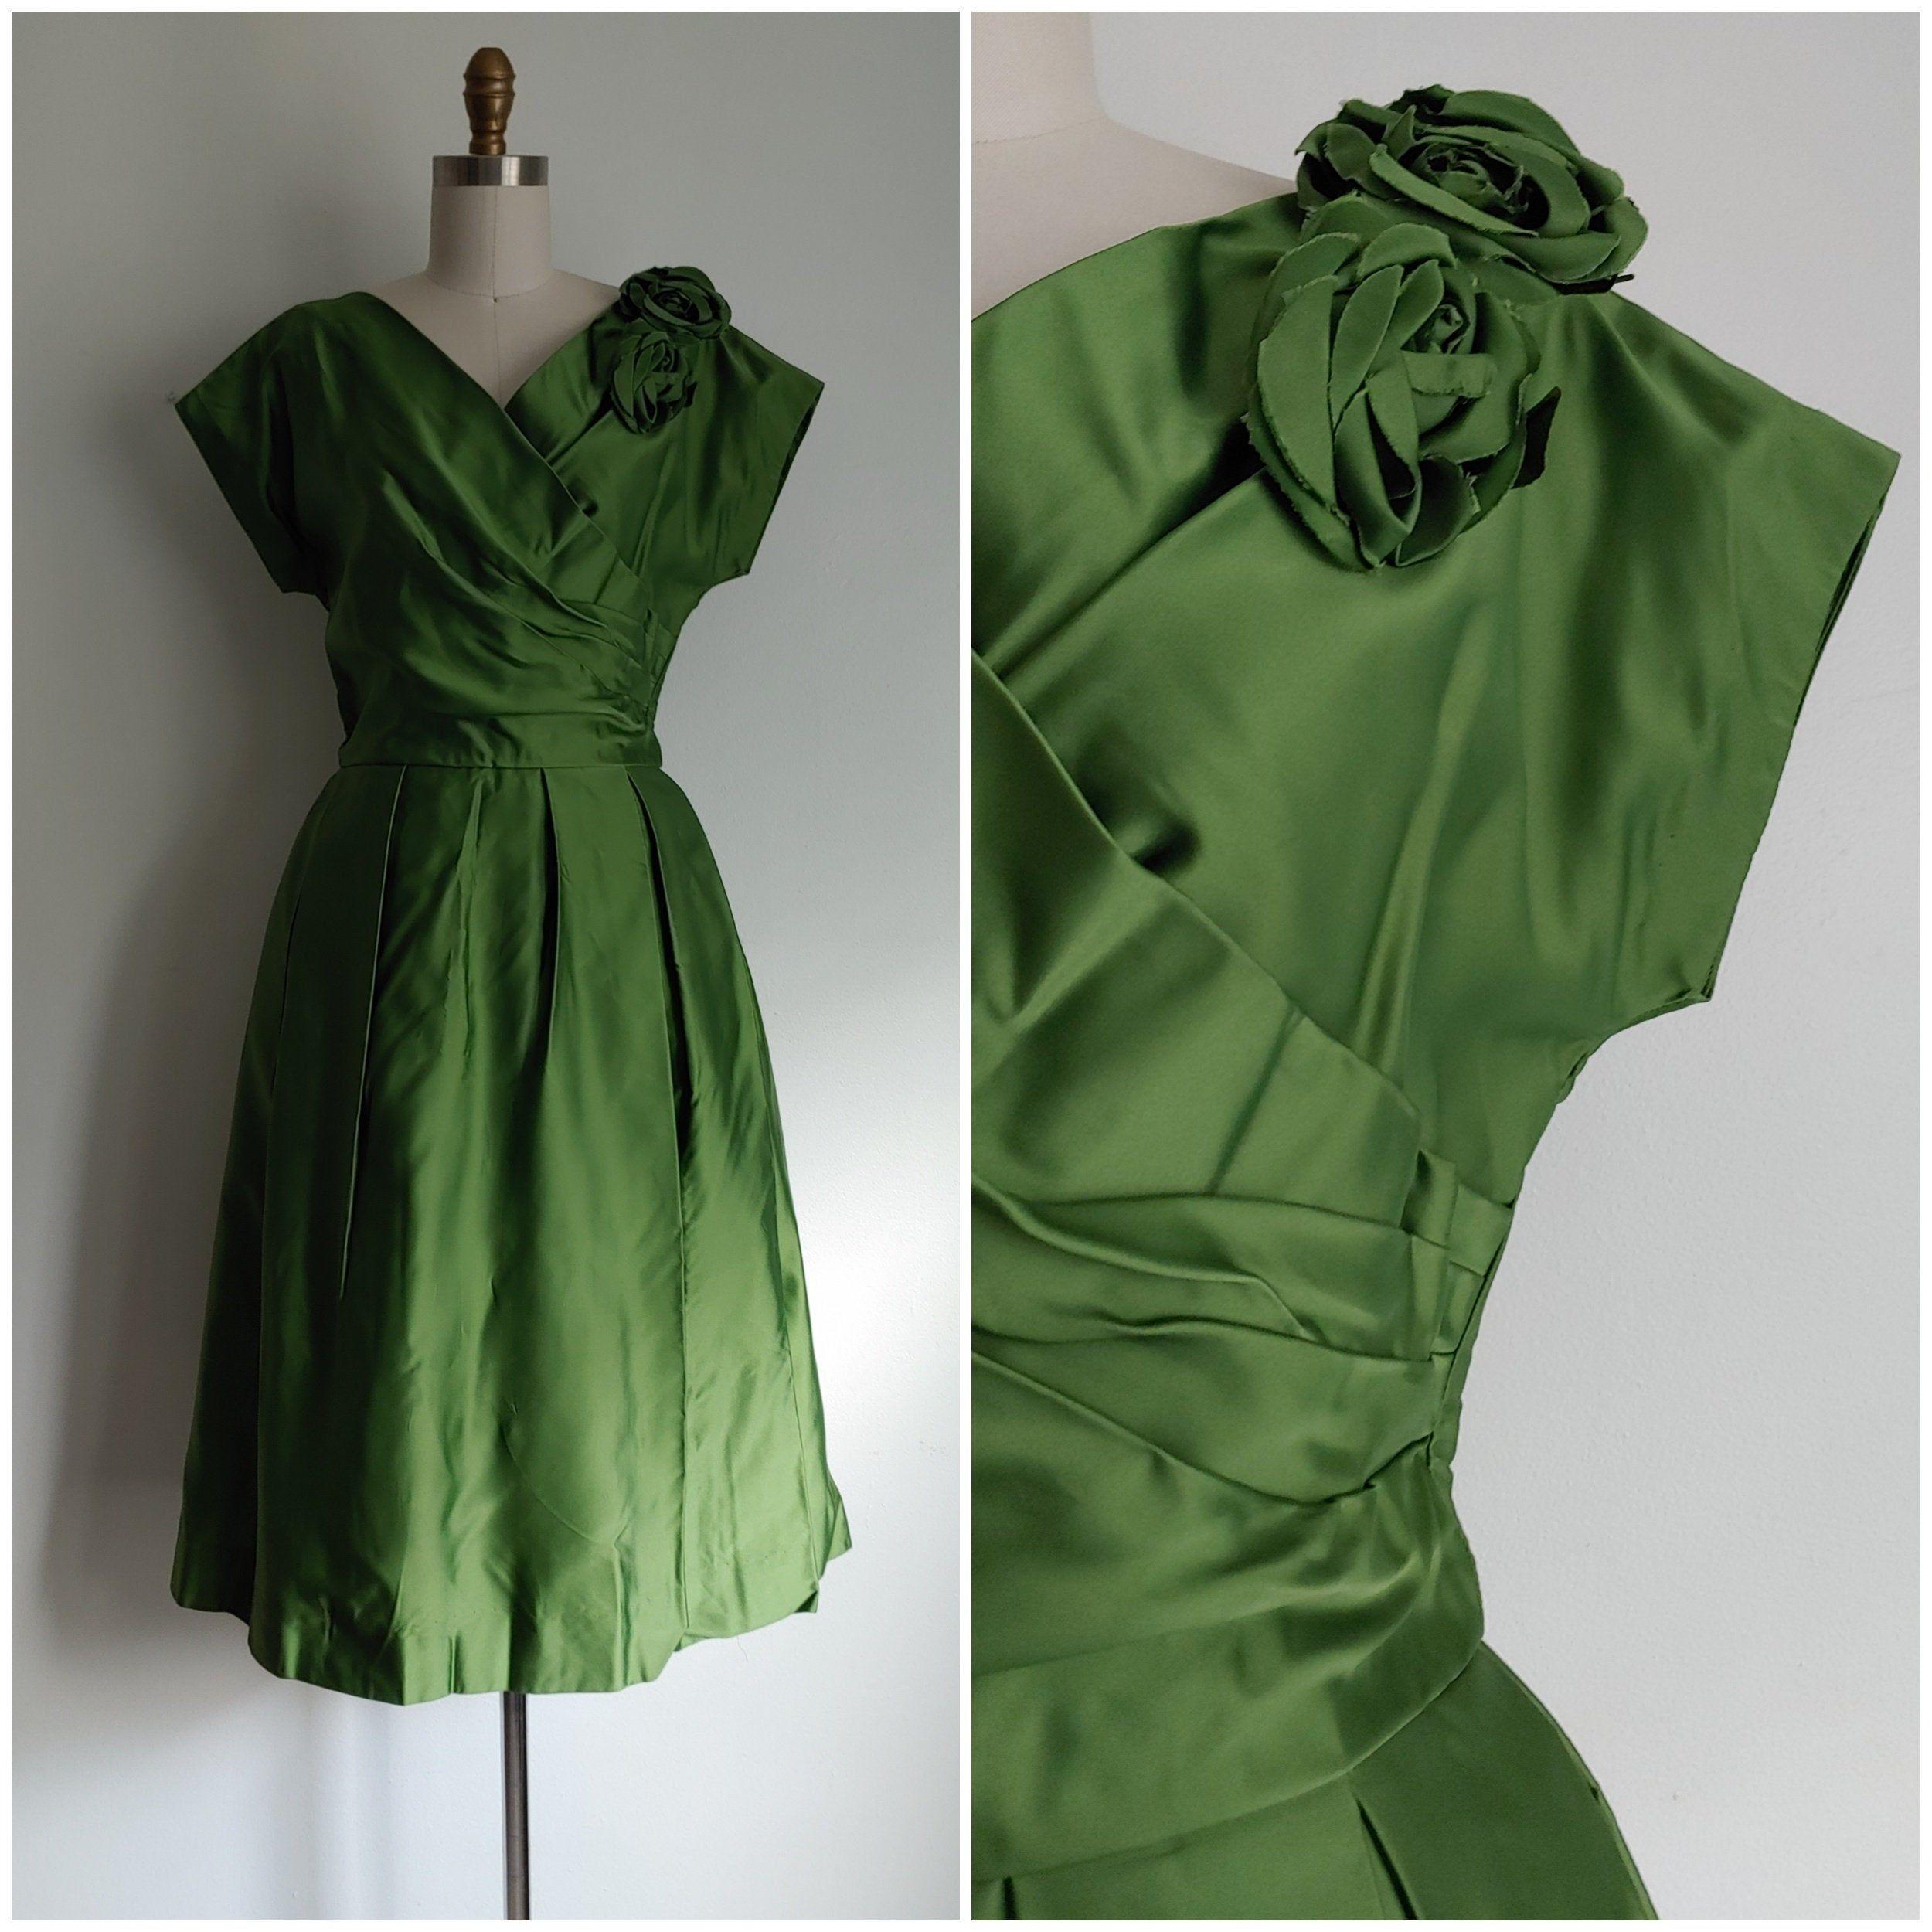 Vintage 1960s Green Formal Cocktail Dress Small Etsy Formal Cocktail Dress Cocktail Evening Dresses Dresses [ 2500 x 2500 Pixel ]